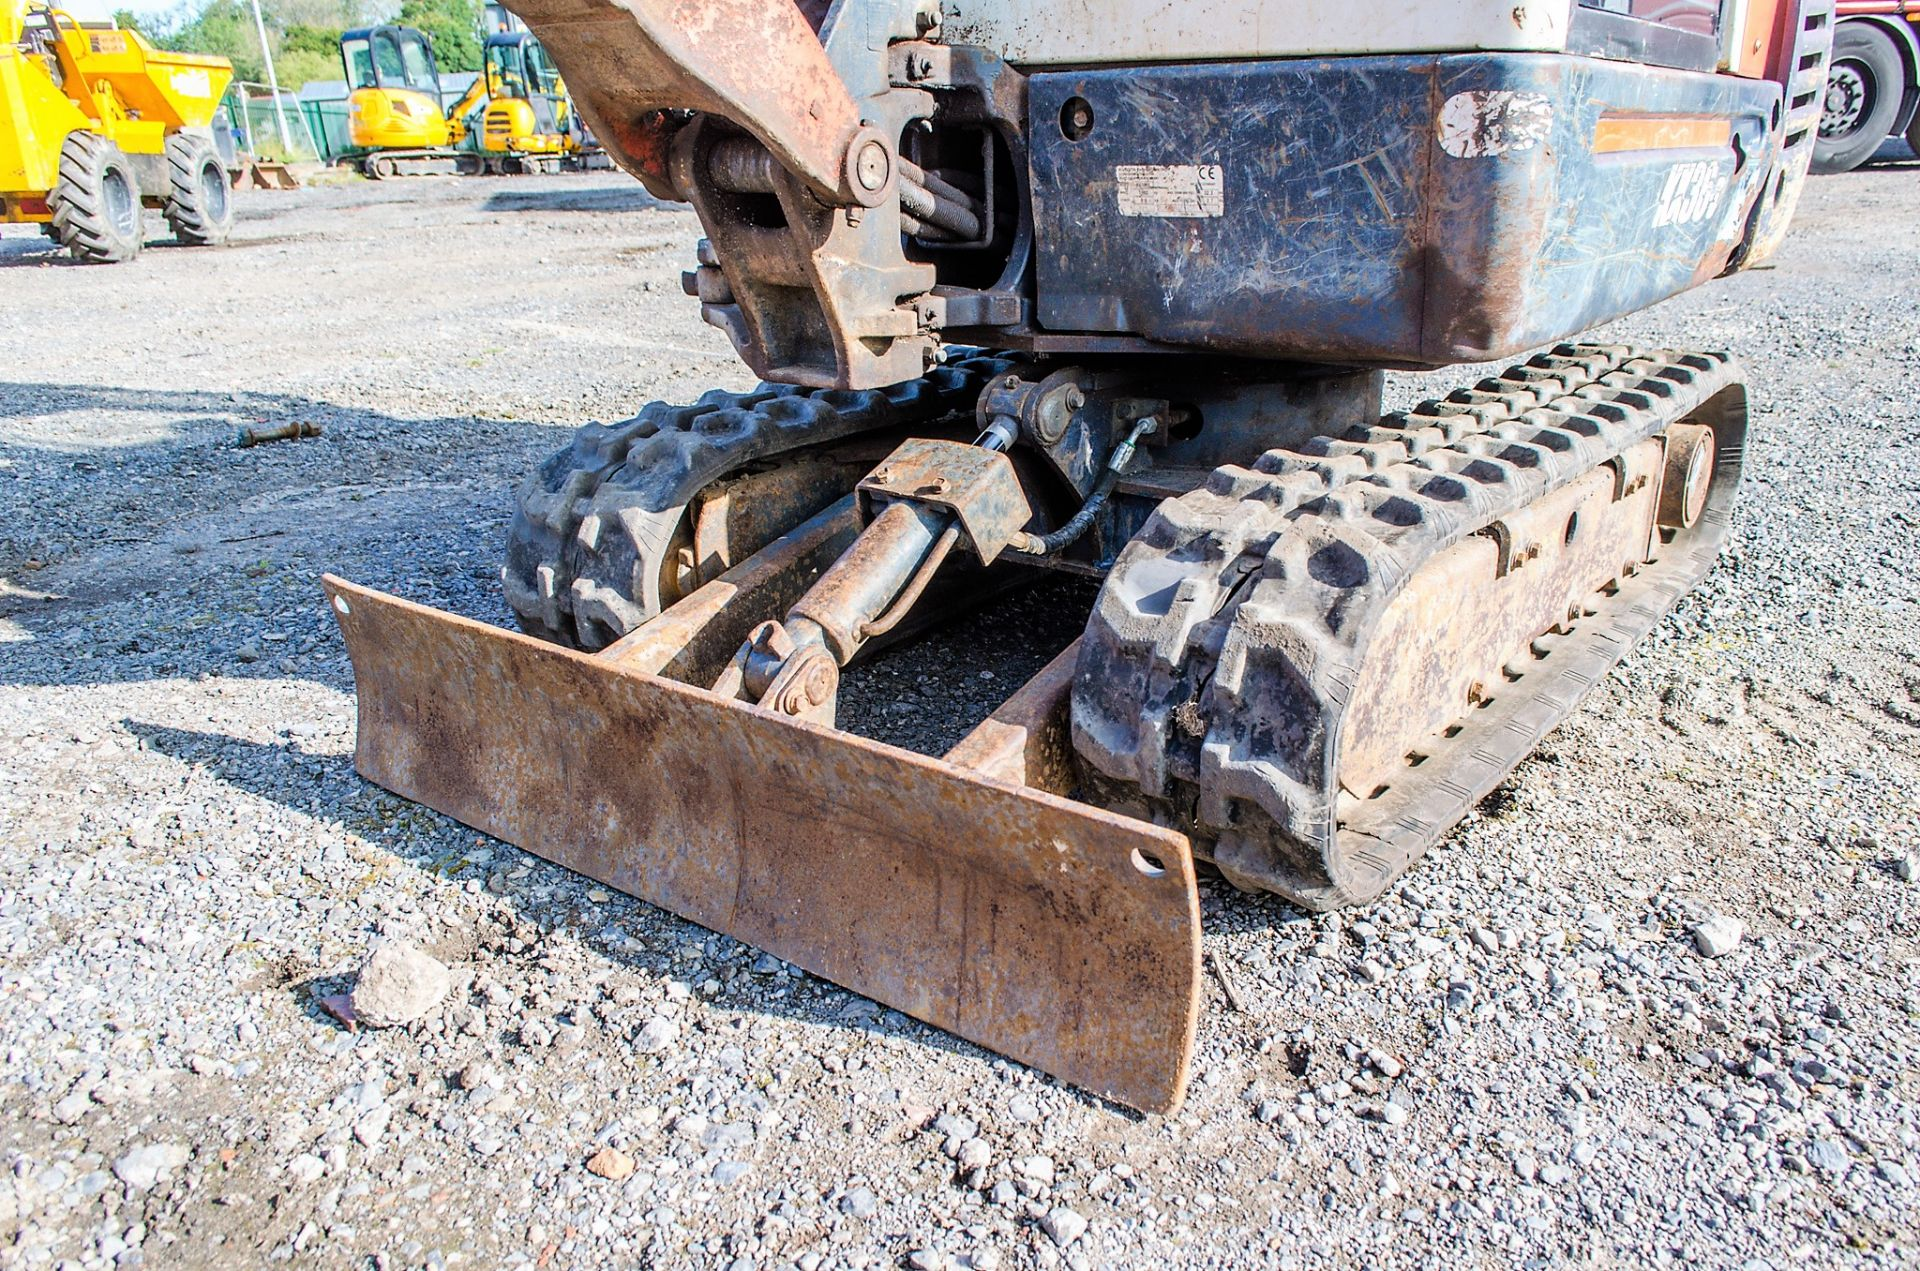 Kubota KX36-3 1.5 tonne rubber tracked mini excavator Year: 2007 S/N: Z077298 Recorded Hours: 4205 - Image 11 of 18